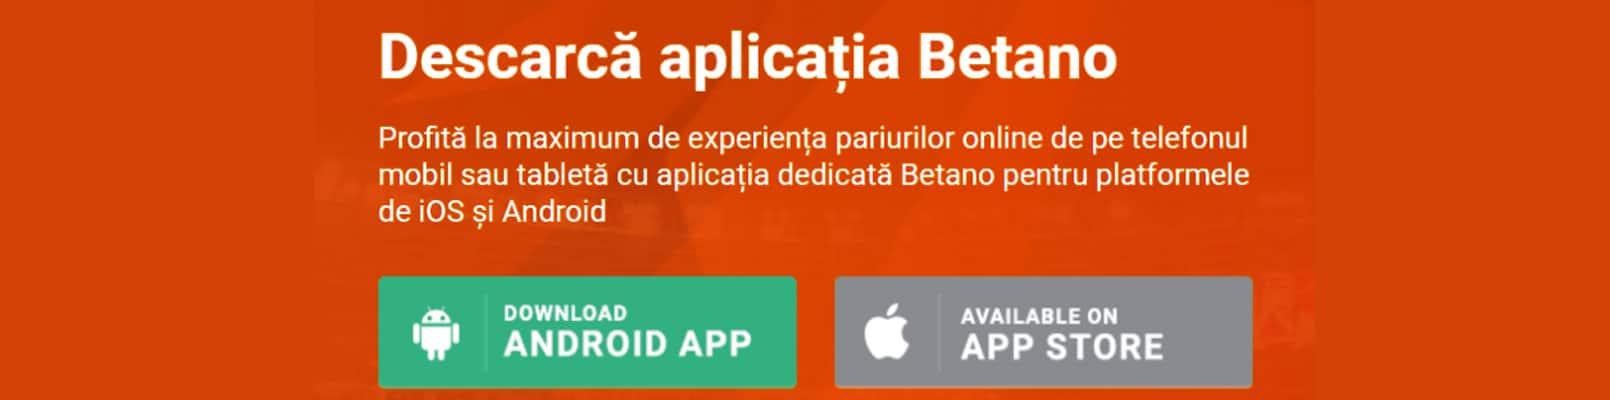 betano app android și iOS